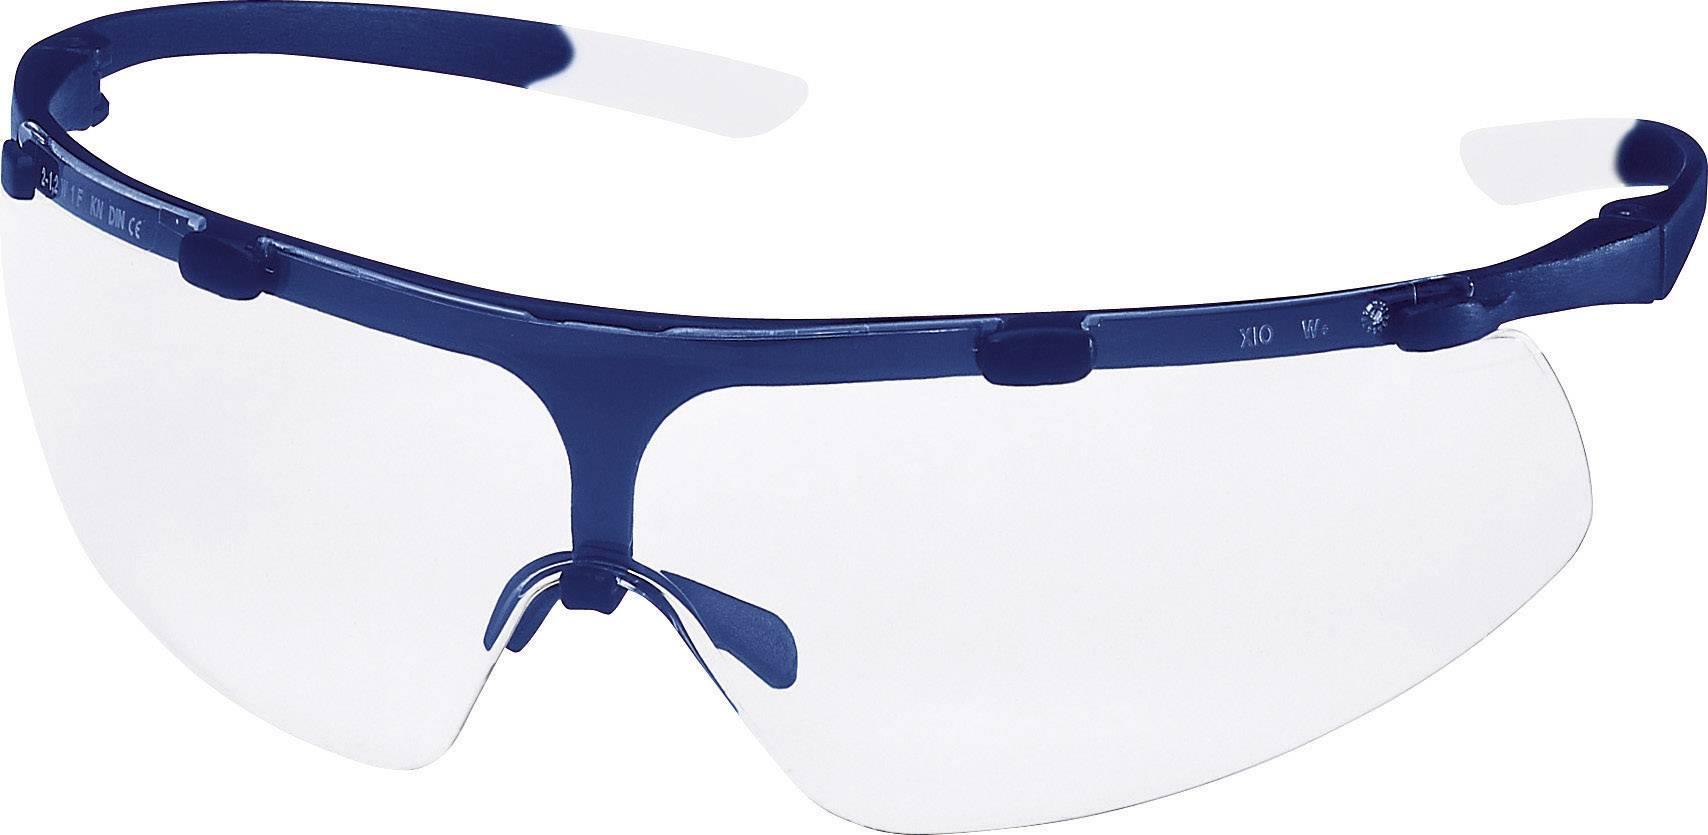 Ochranné okuliare Uvex Super Fit 9178